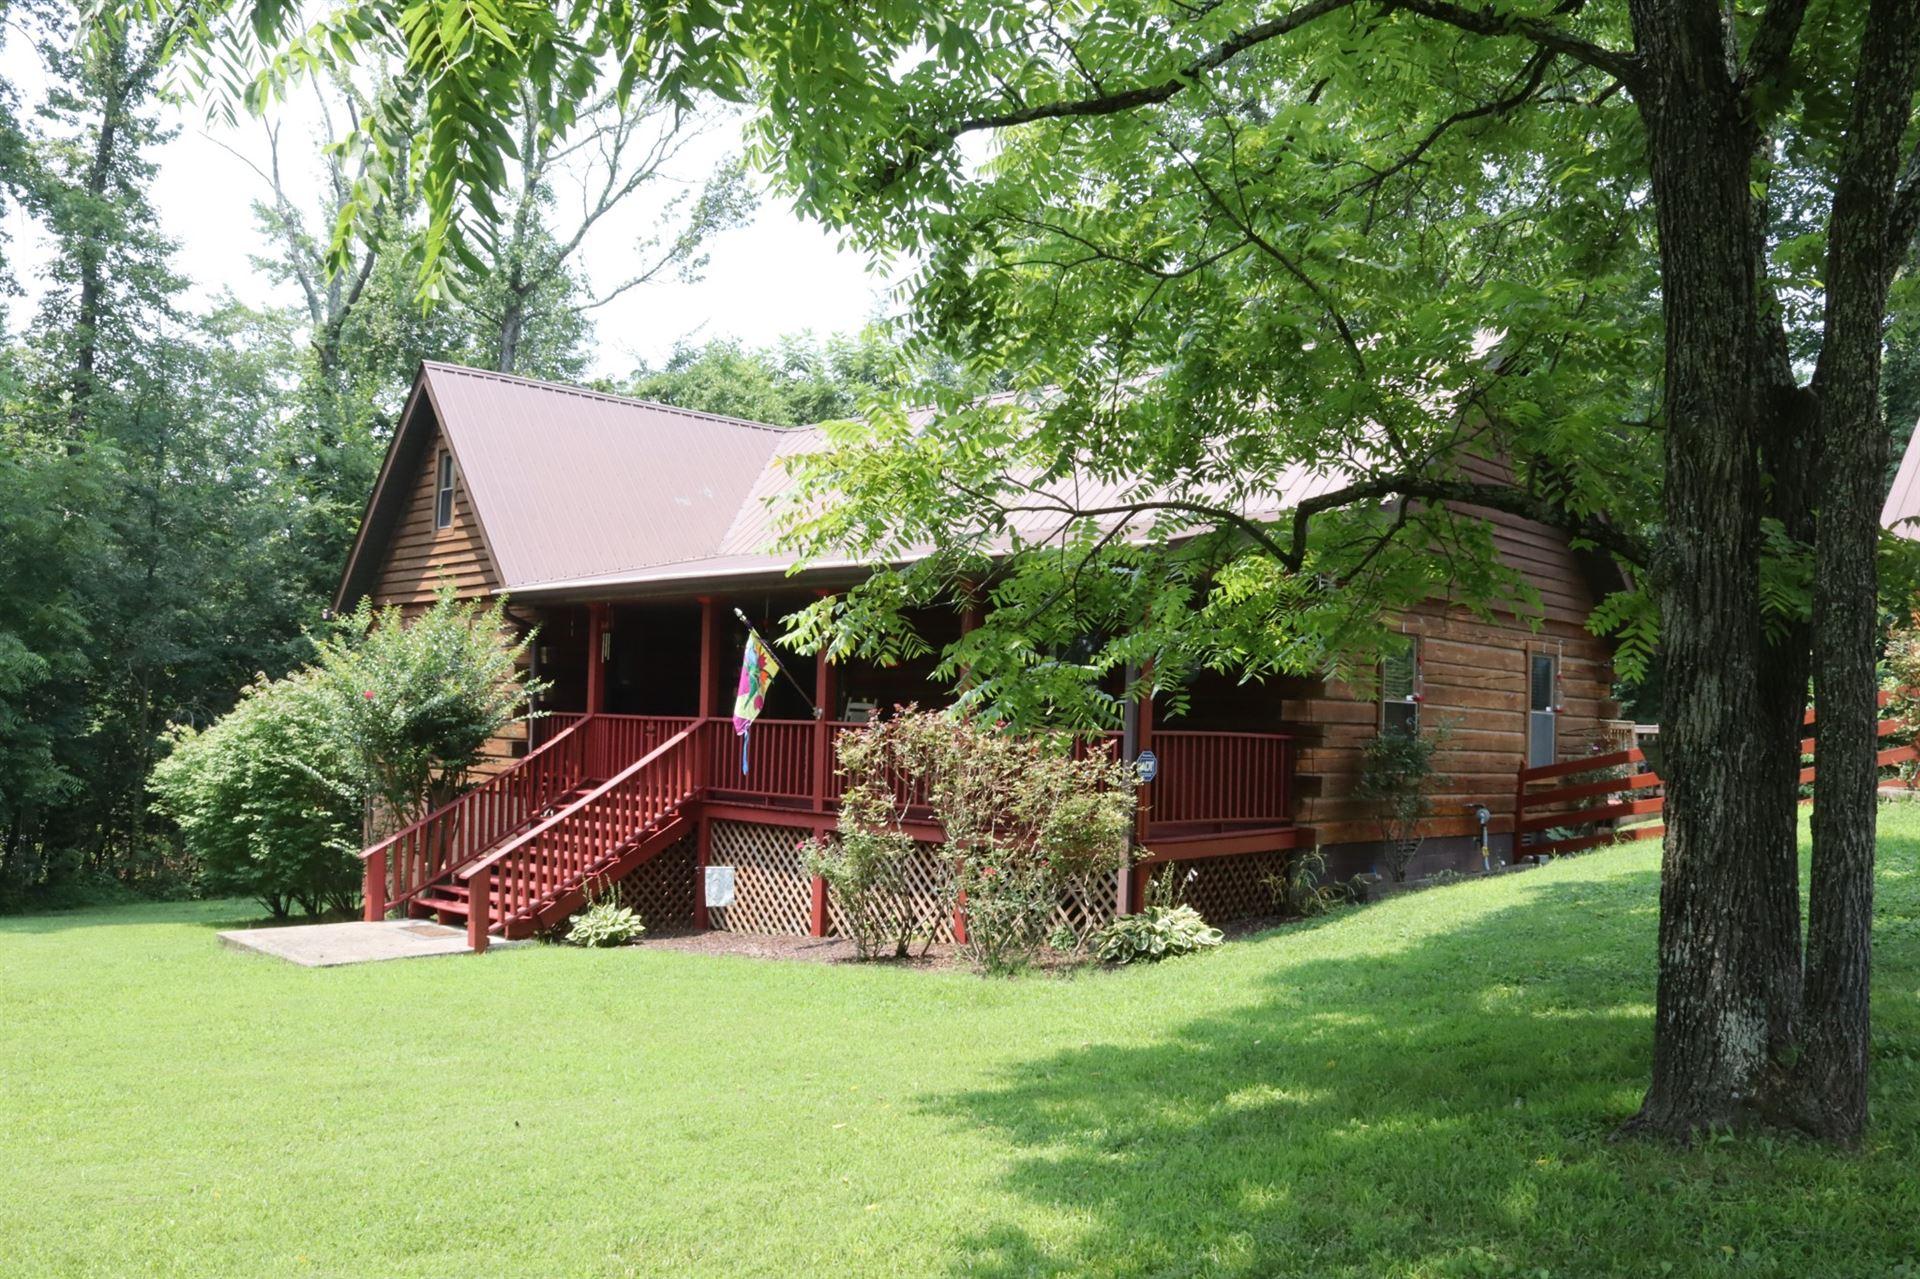 2101 Center Point Rd, Cumberland Furnace, TN 37051 - MLS#: 2275134